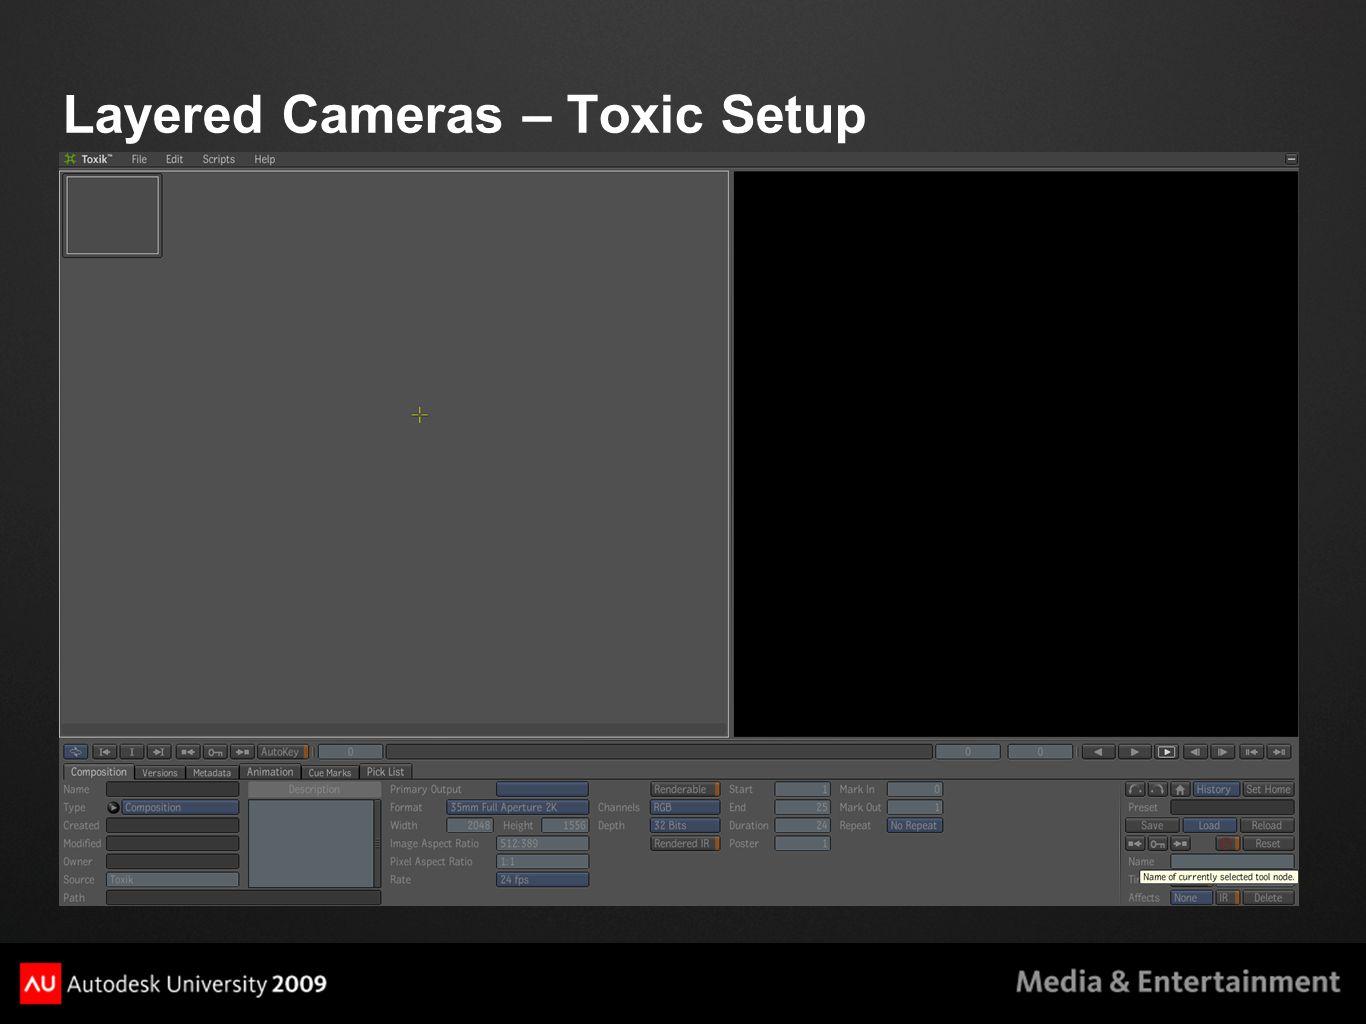 Layered Cameras – Toxic Setup